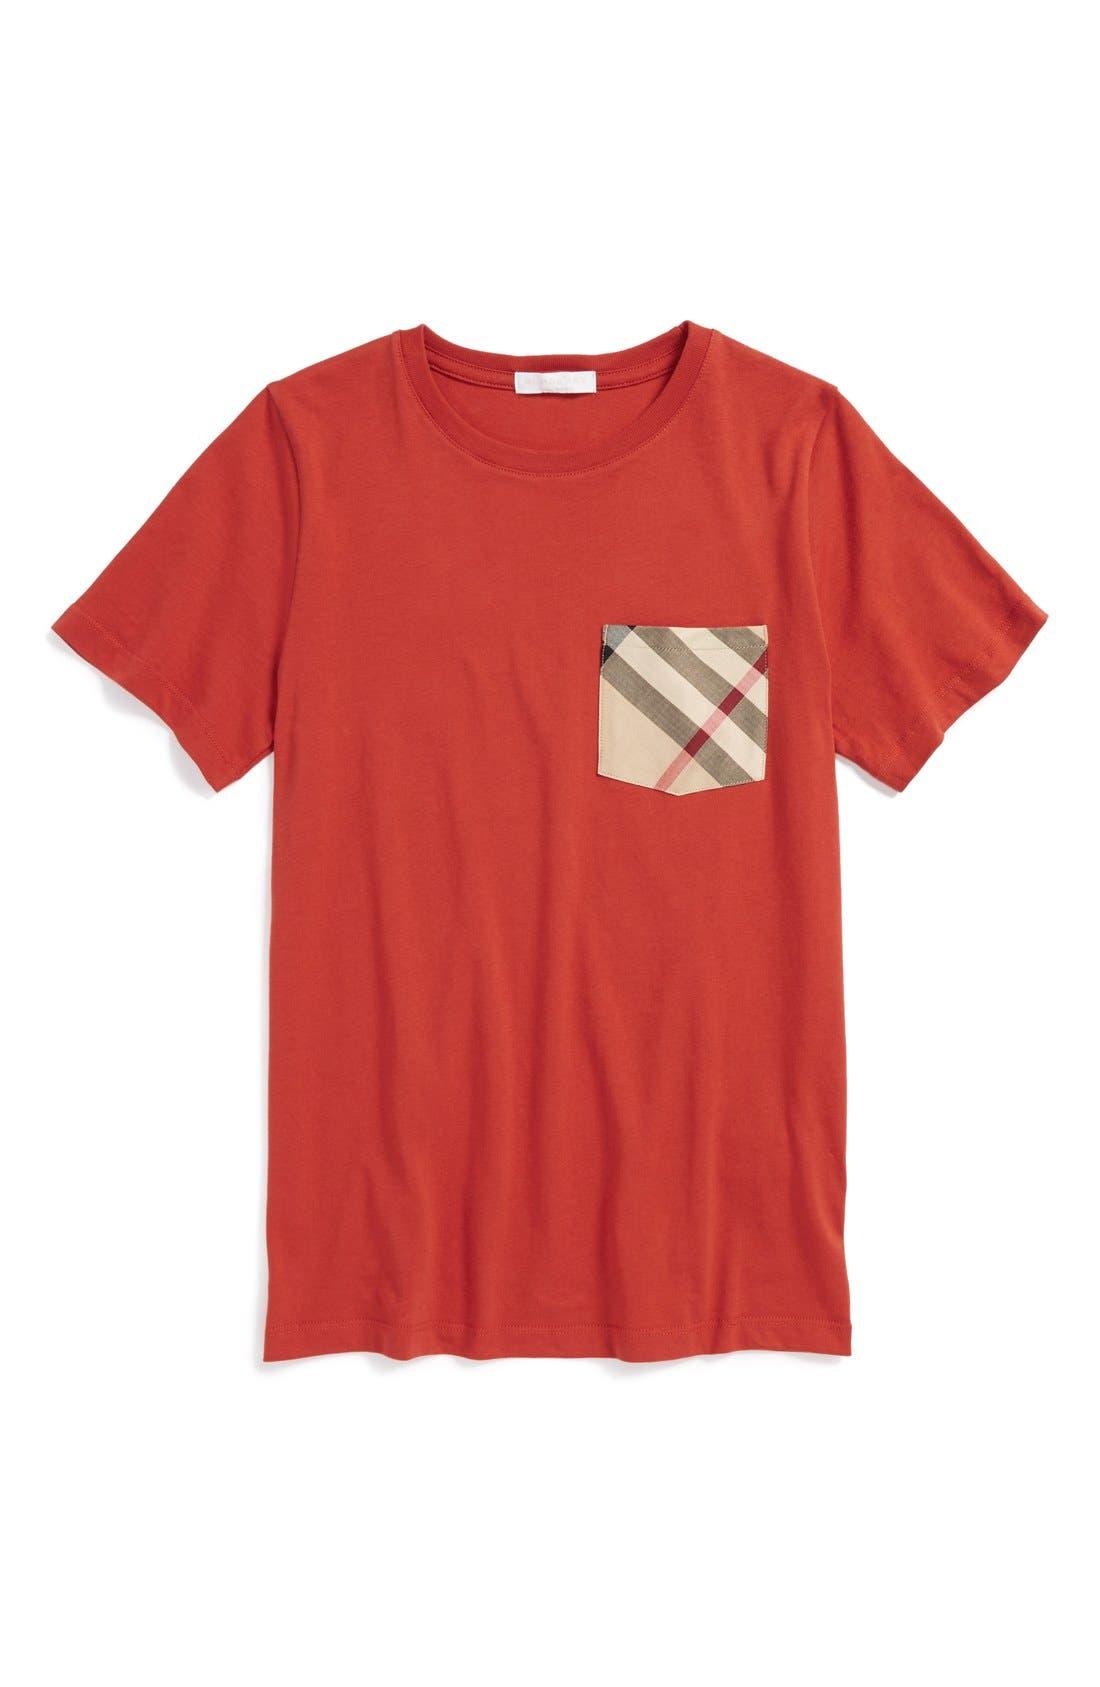 Alternate Image 1 Selected - Burberry Check Print Chest Pocket T-Shirt (Little Boys & Big Boys)